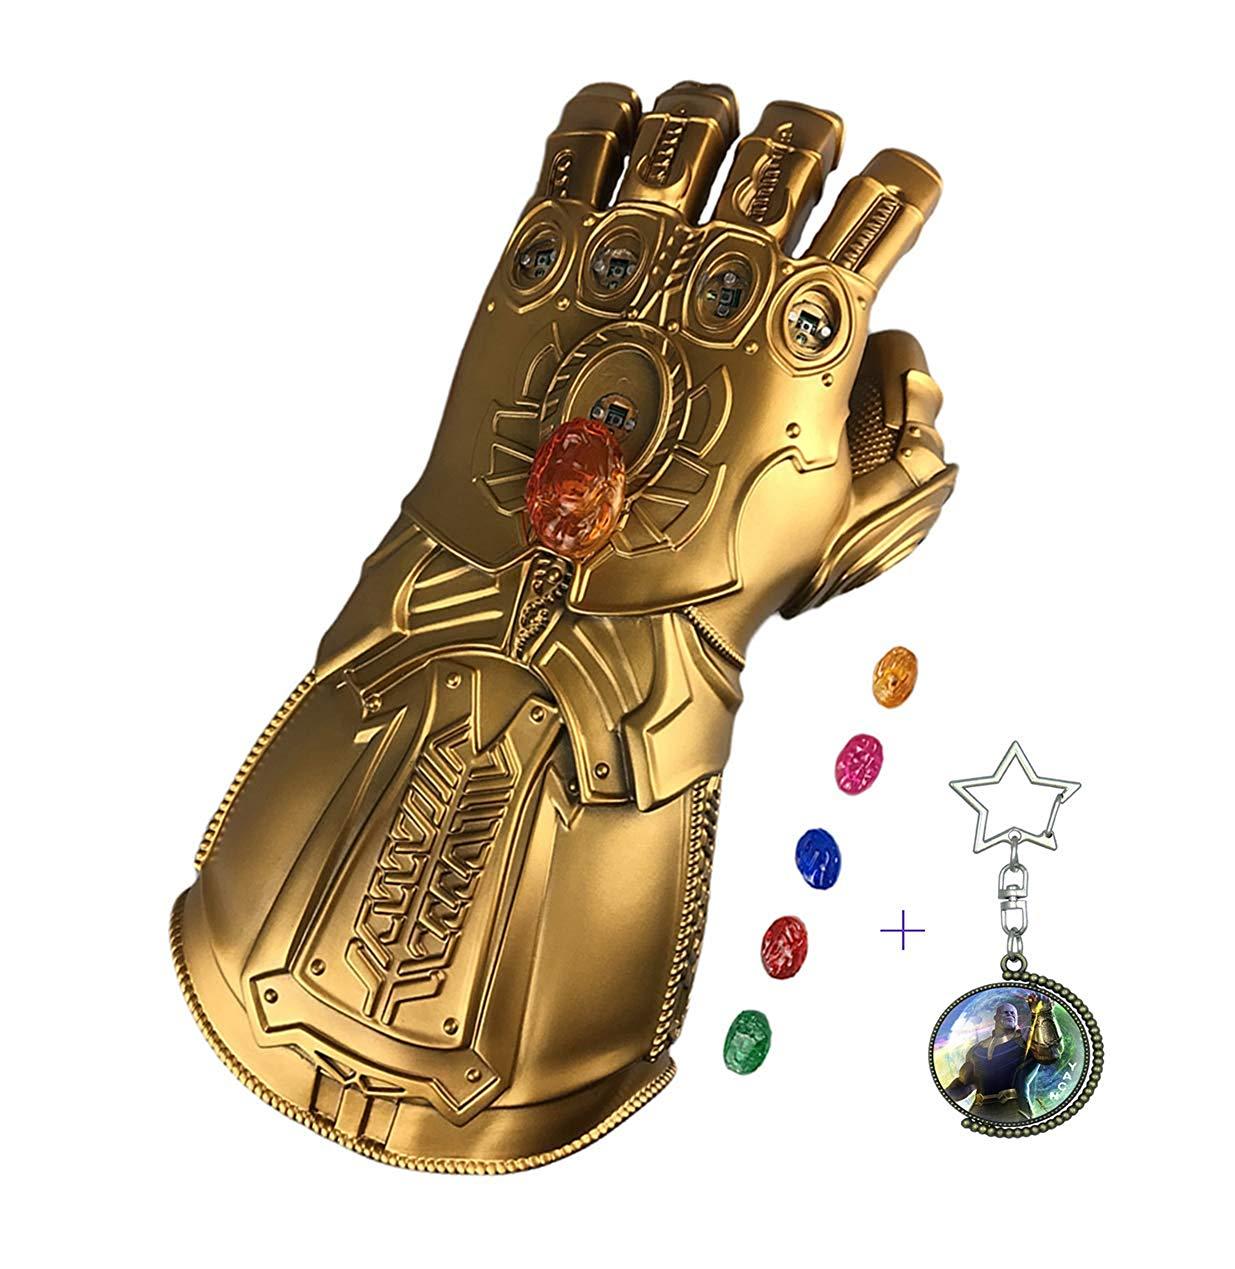 Yacn Infinity gantelet Thanos gant PVC LED avec 6 LED pierres infinies magnétiques armes et armure cosplay accessoires